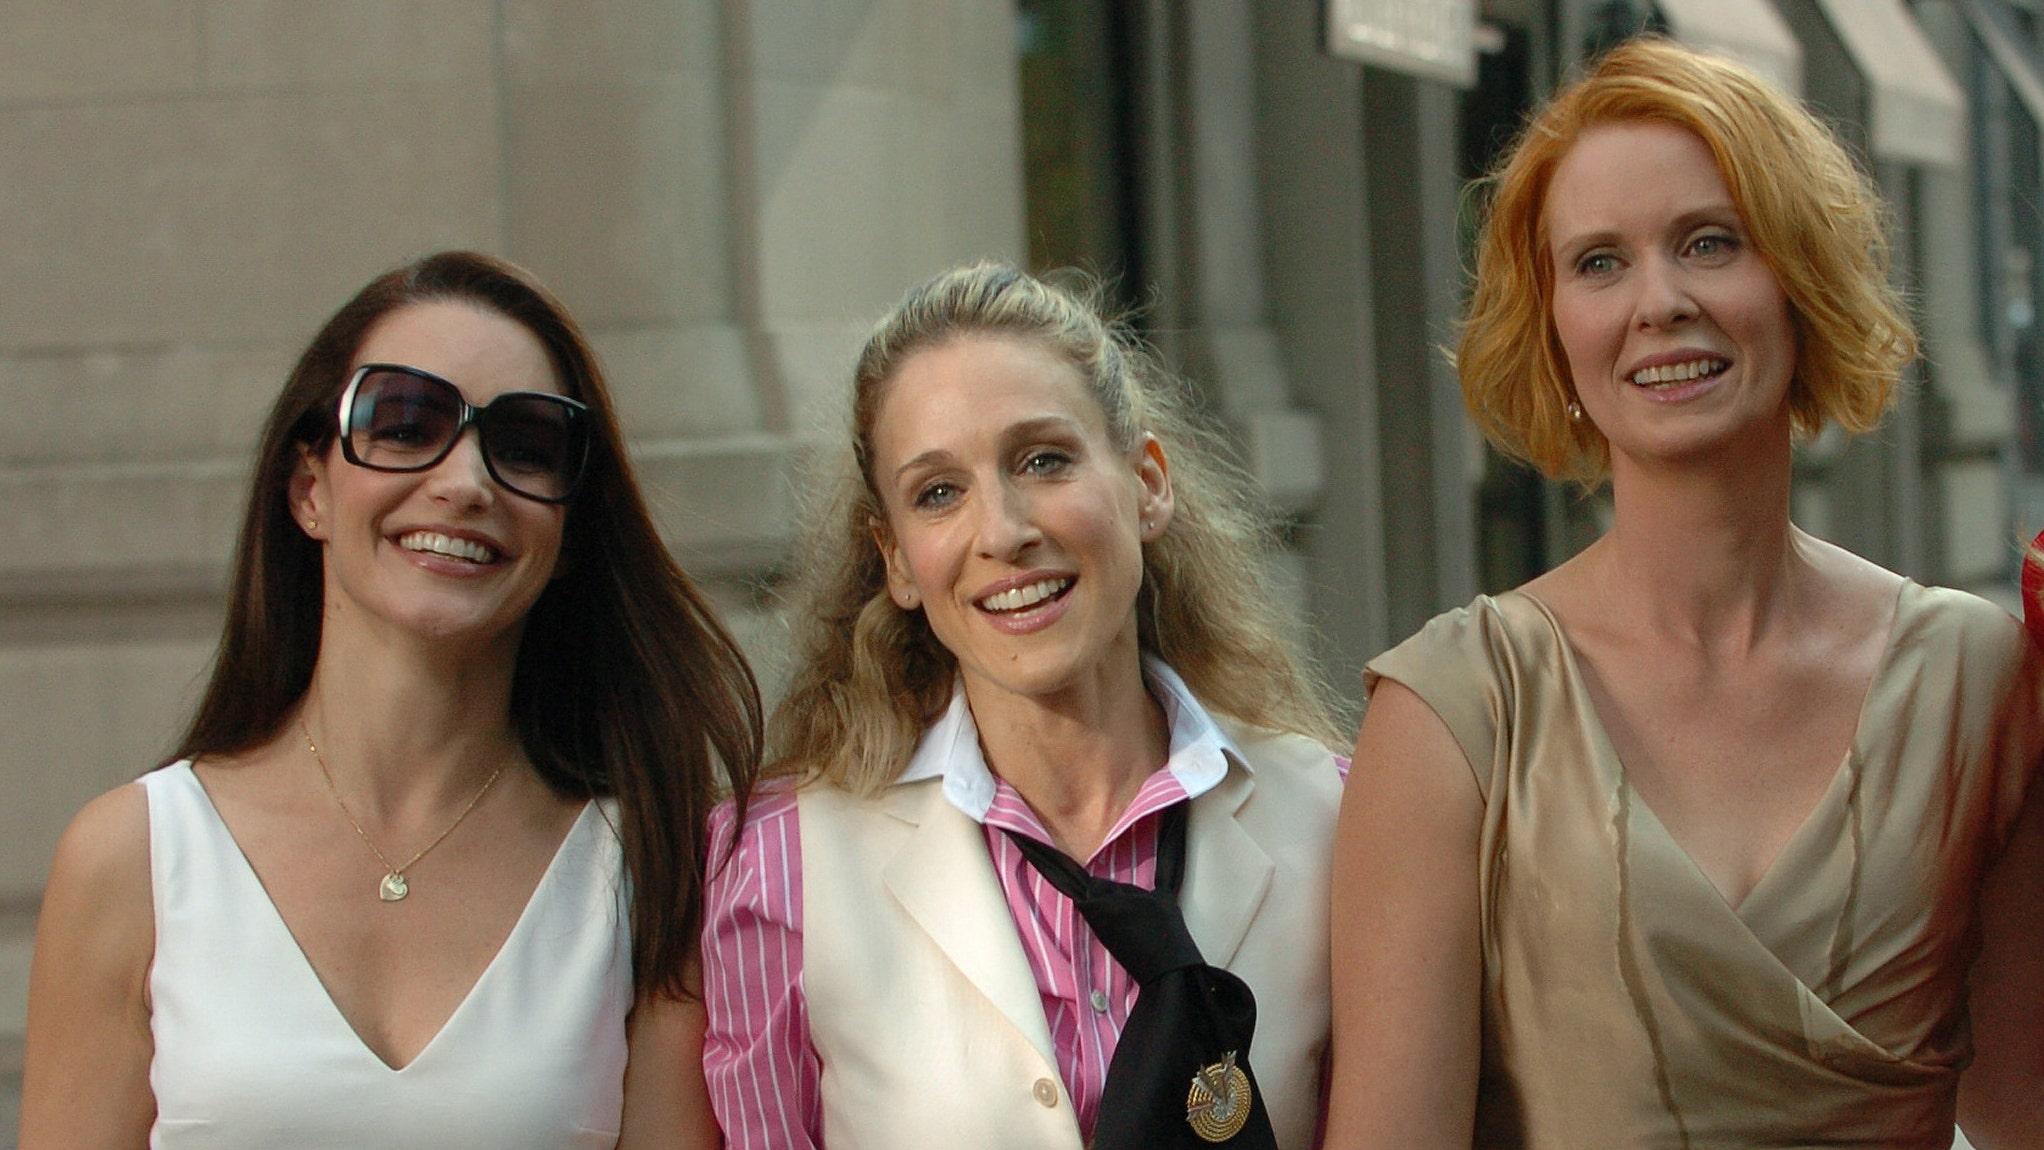 'Sex and the City' reboot first look: Sarah Jessica Parker, Cynthia Nixon, and Kristin Davis return